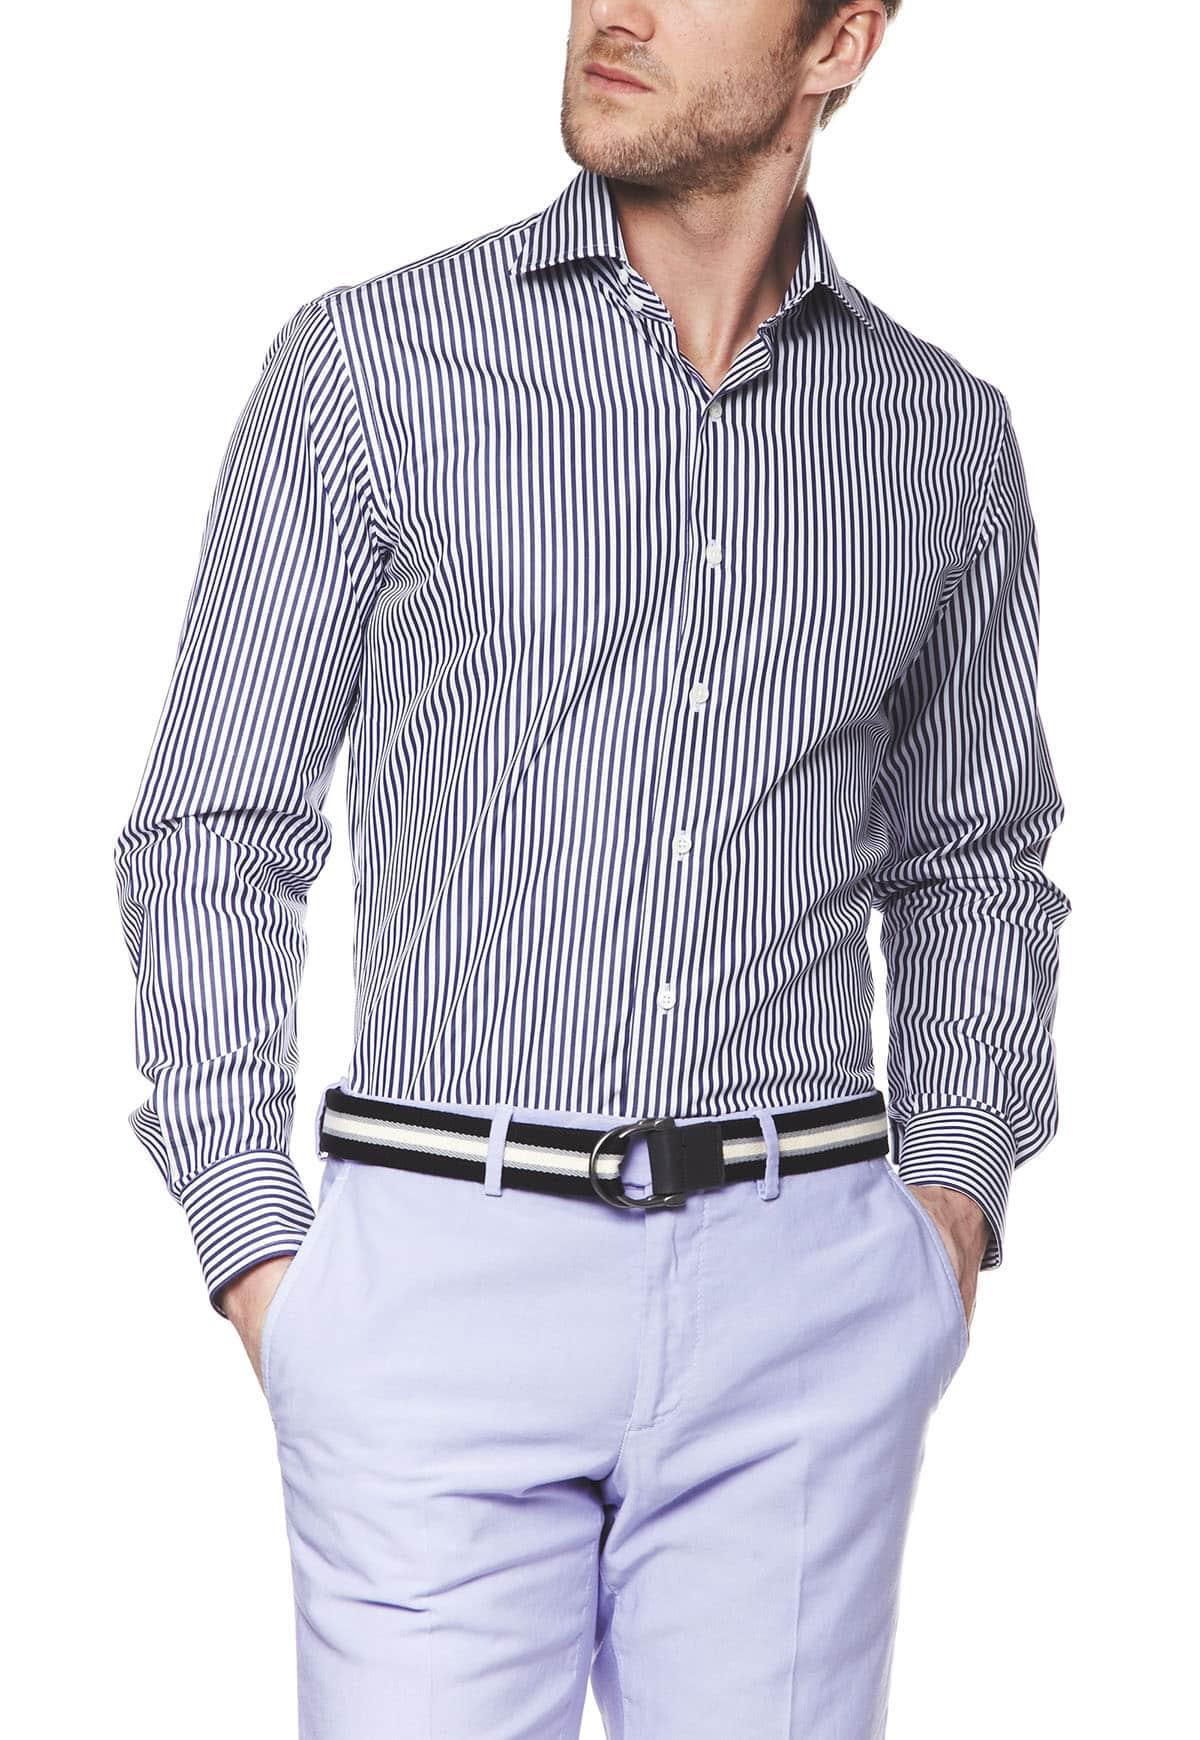 chemise homme manches longues coupe ajustee col napoli popeline bleu marine  fonce raye coton face alain